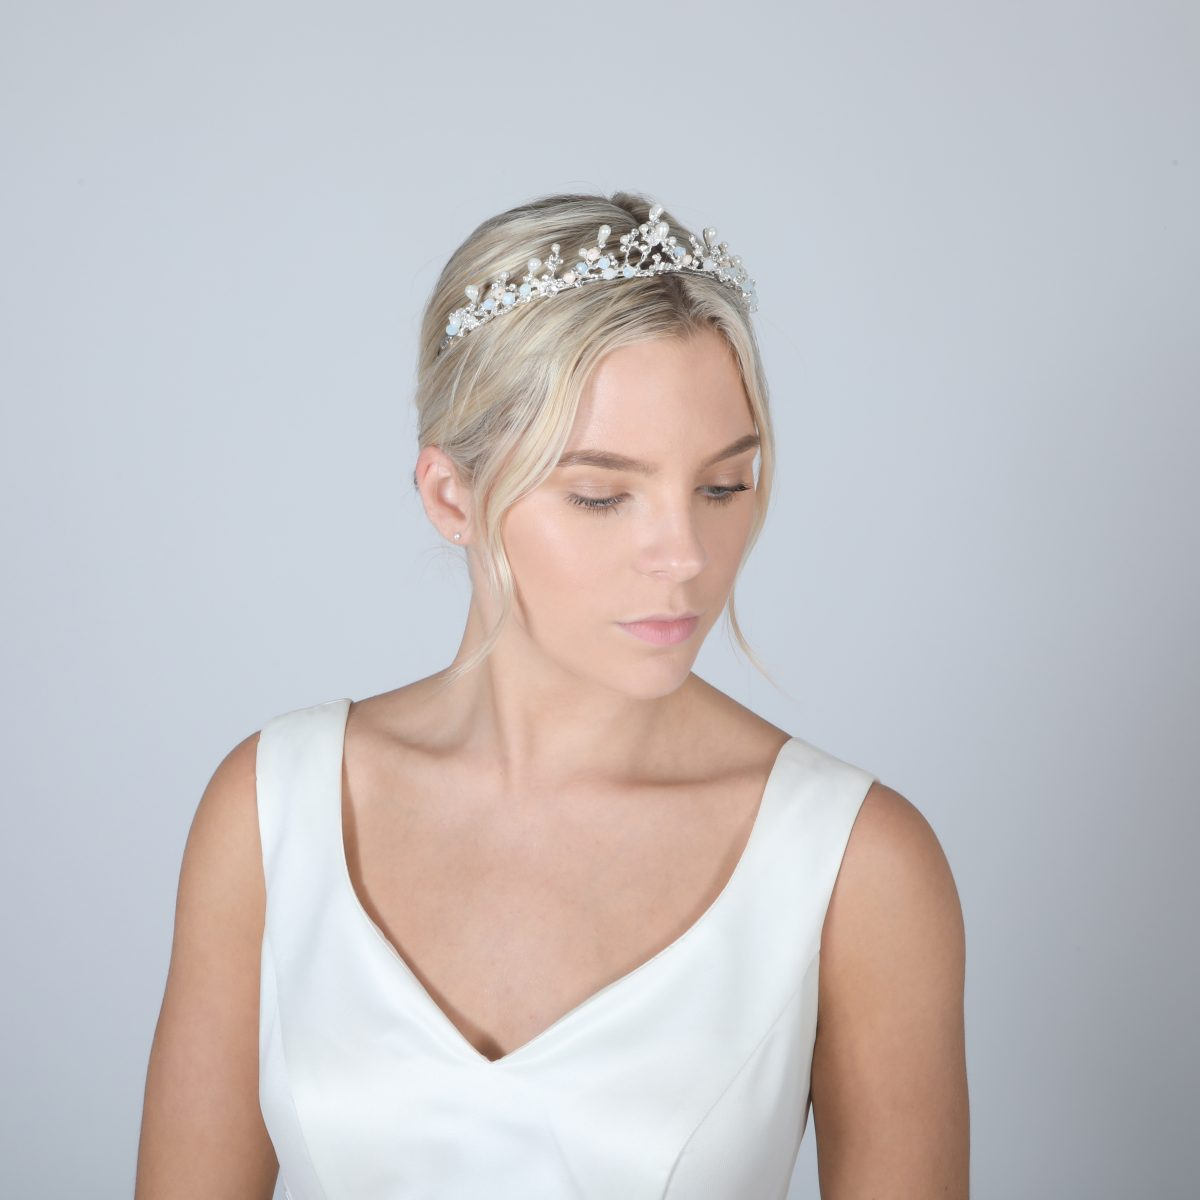 Perfect Bridal Low Crown - PBT5025 - Silver Tone 1